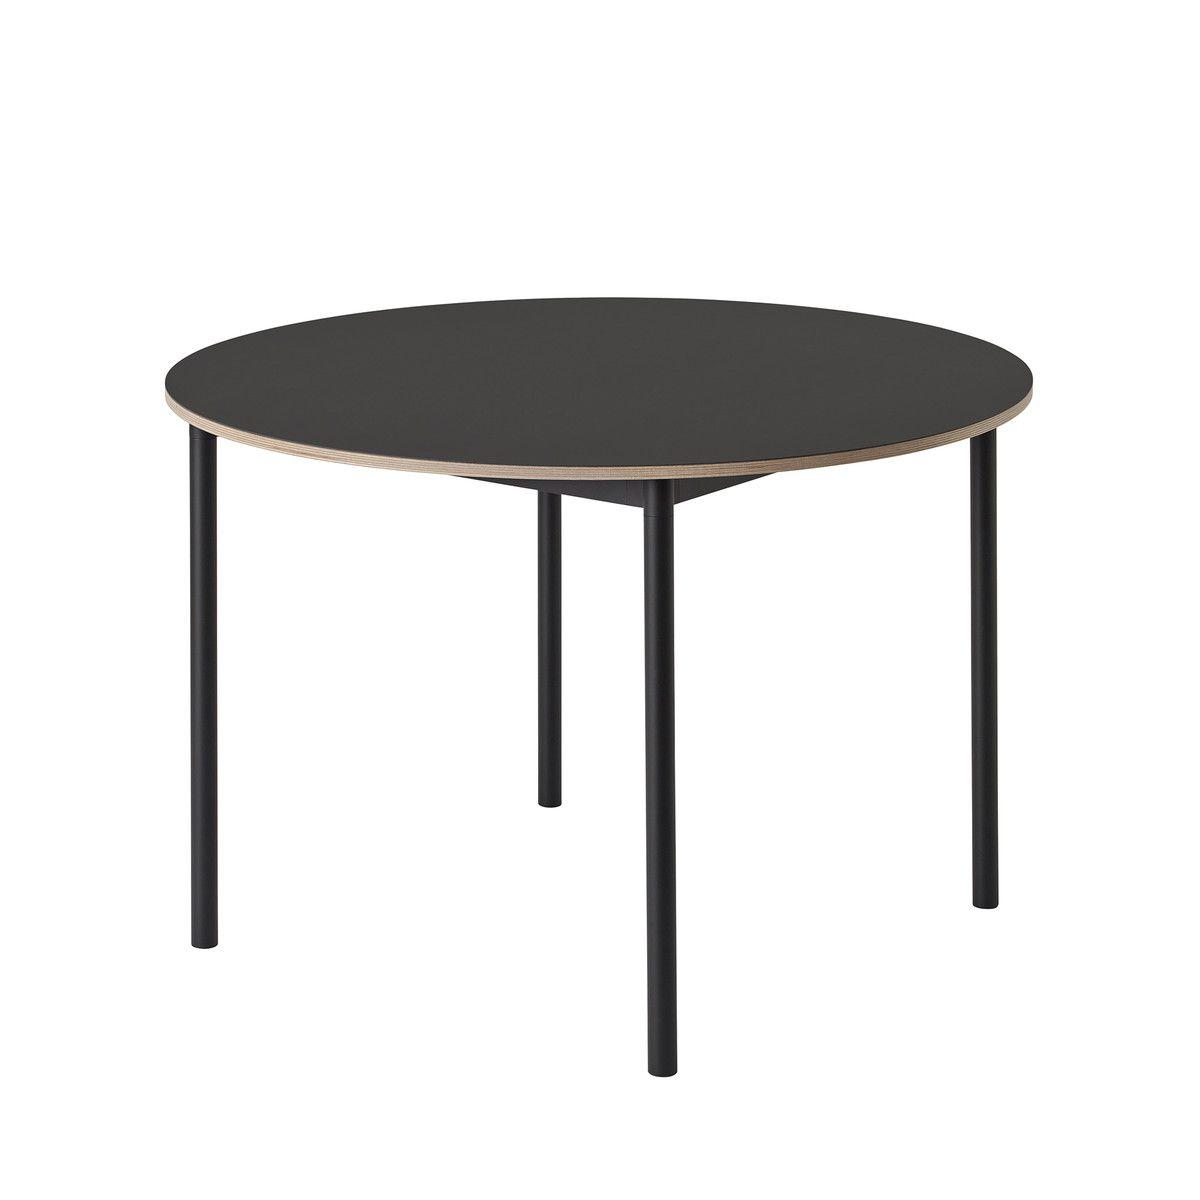 Muuto - Base Table Ø 110 Cm, Laminat Mit Sperrholzkante / Weiß